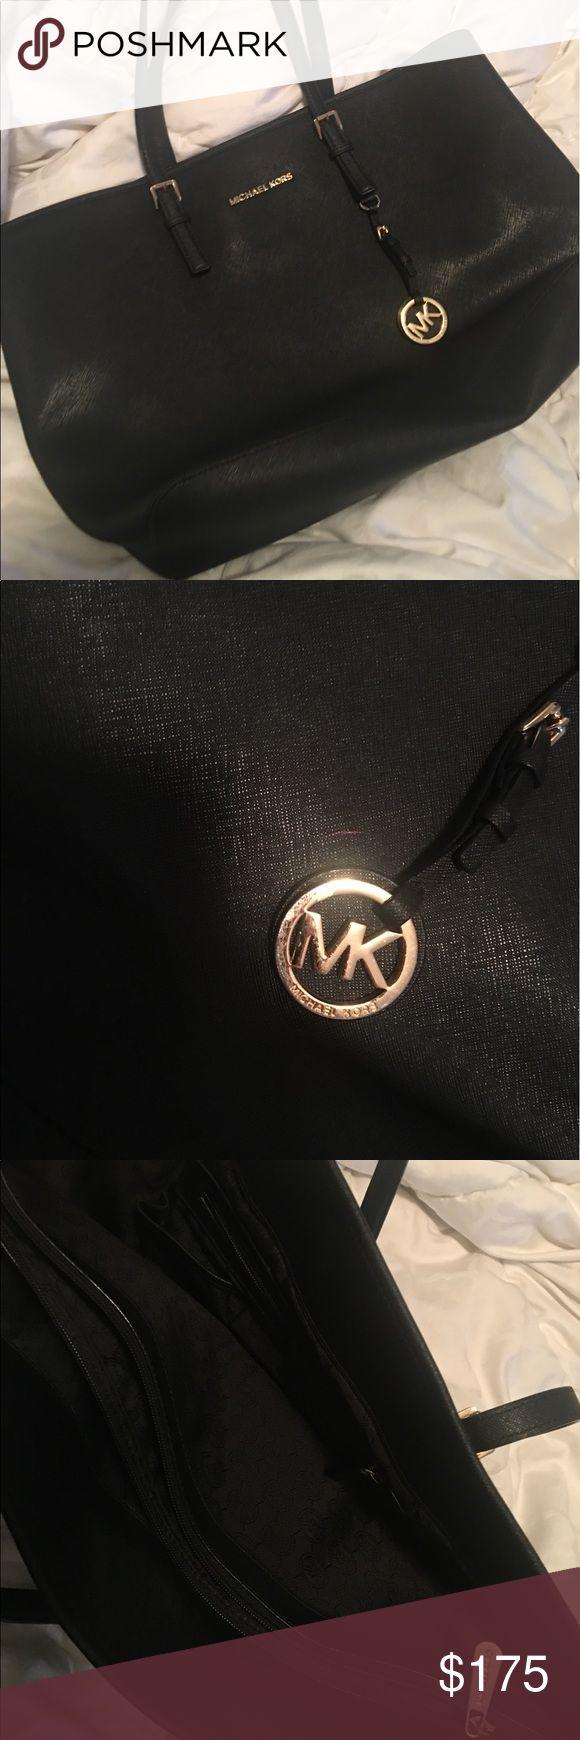 MICHAEL KORS JET SET LARGE USED MICHAEL KORS JET SET LARGE USED MICHAEL Michael Kors Bags Shoulder Bags